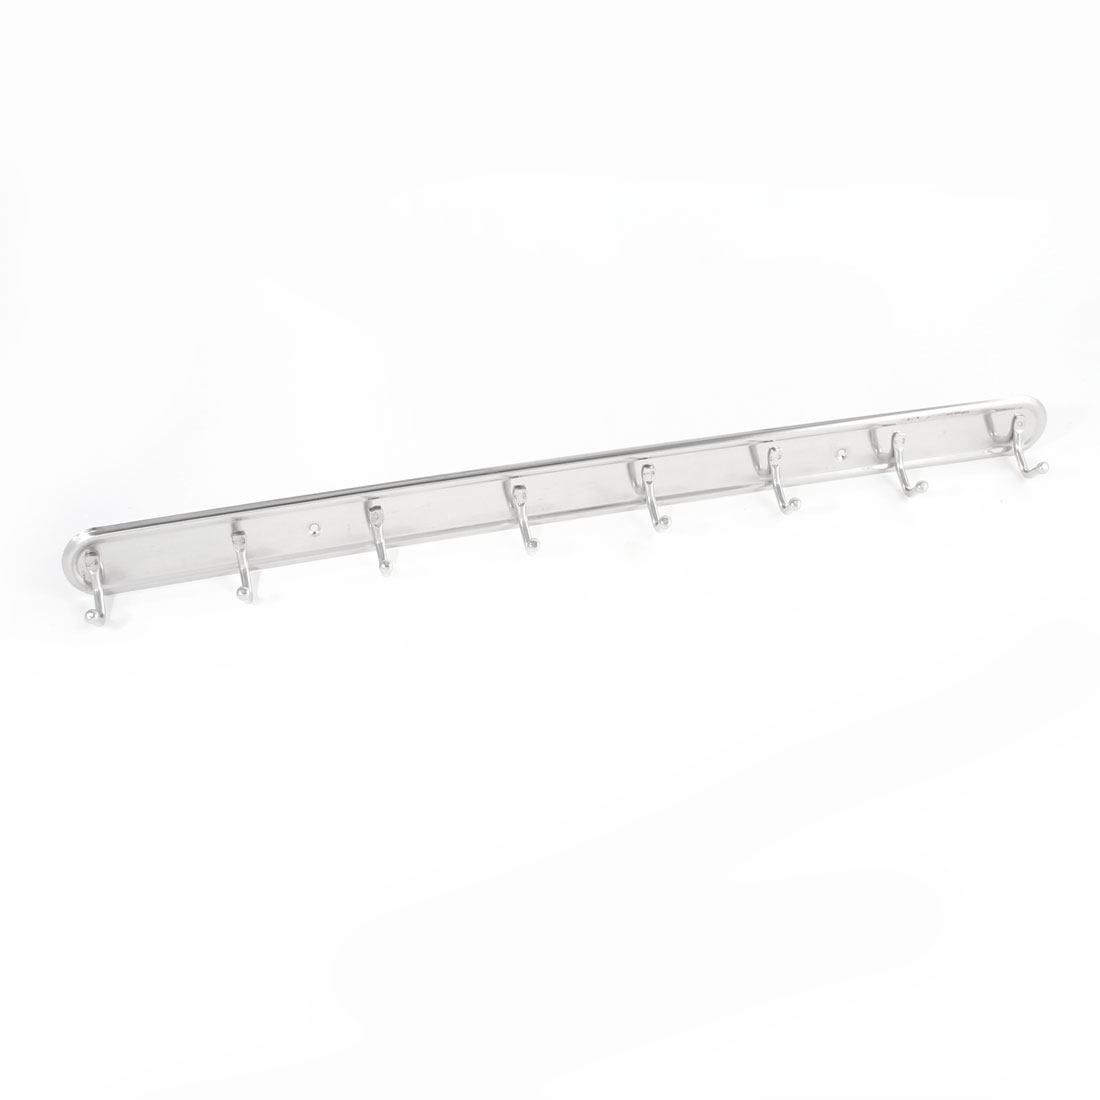 Wall Mounted Stainless Steel 8 Hooks Home Batnroom Towel Hanger Rack